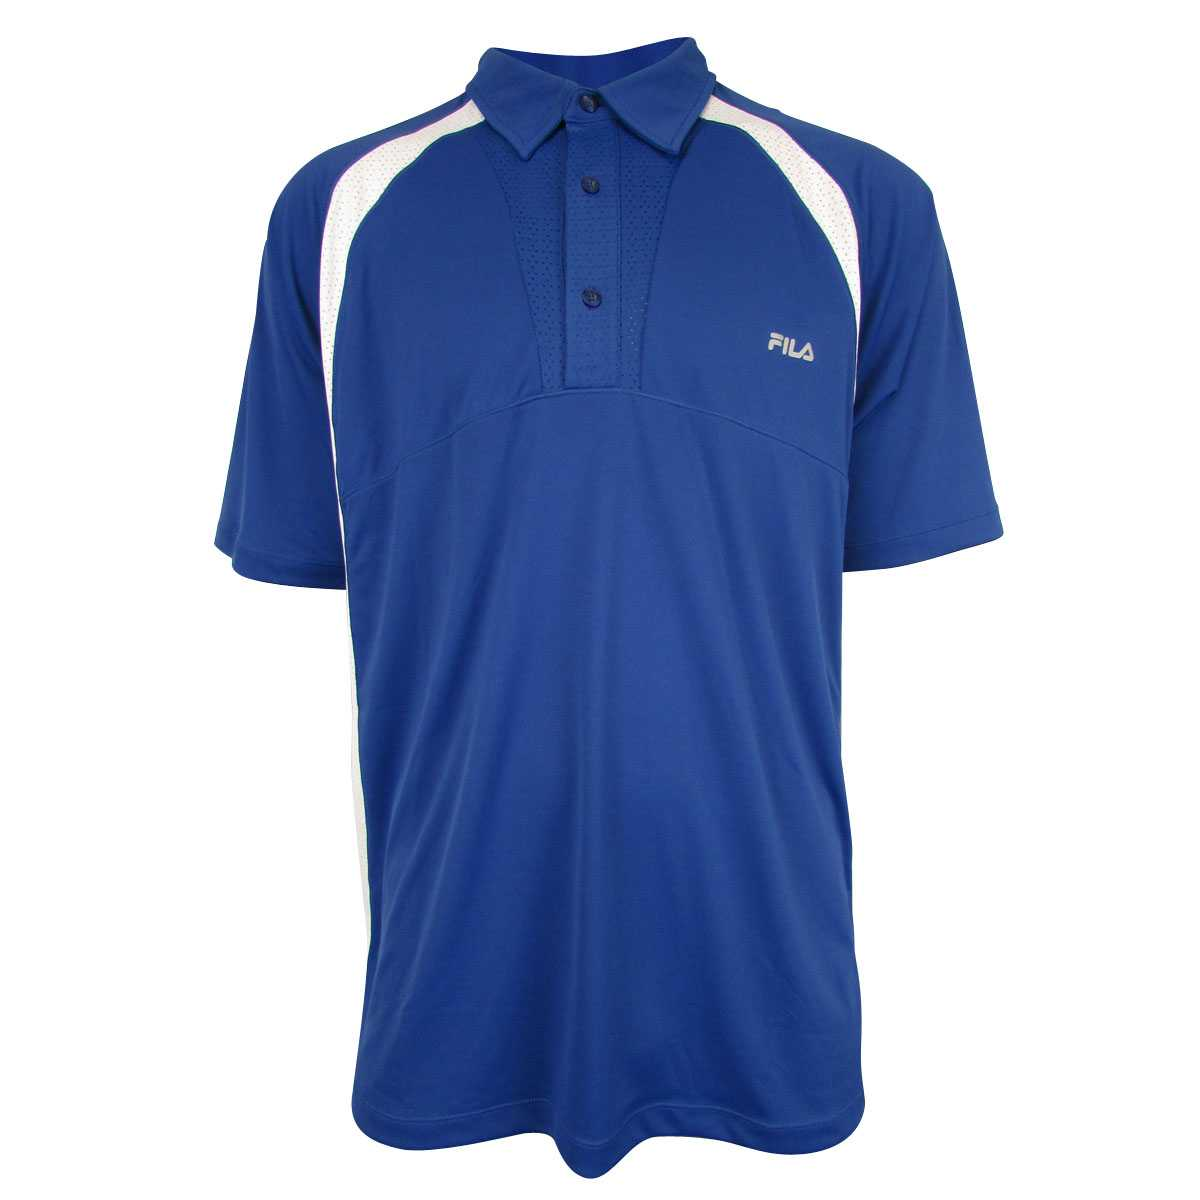 fila vintage polo. mens fila vintage magliette classic pique polo shirt tee t-shirt 80s tennis top y